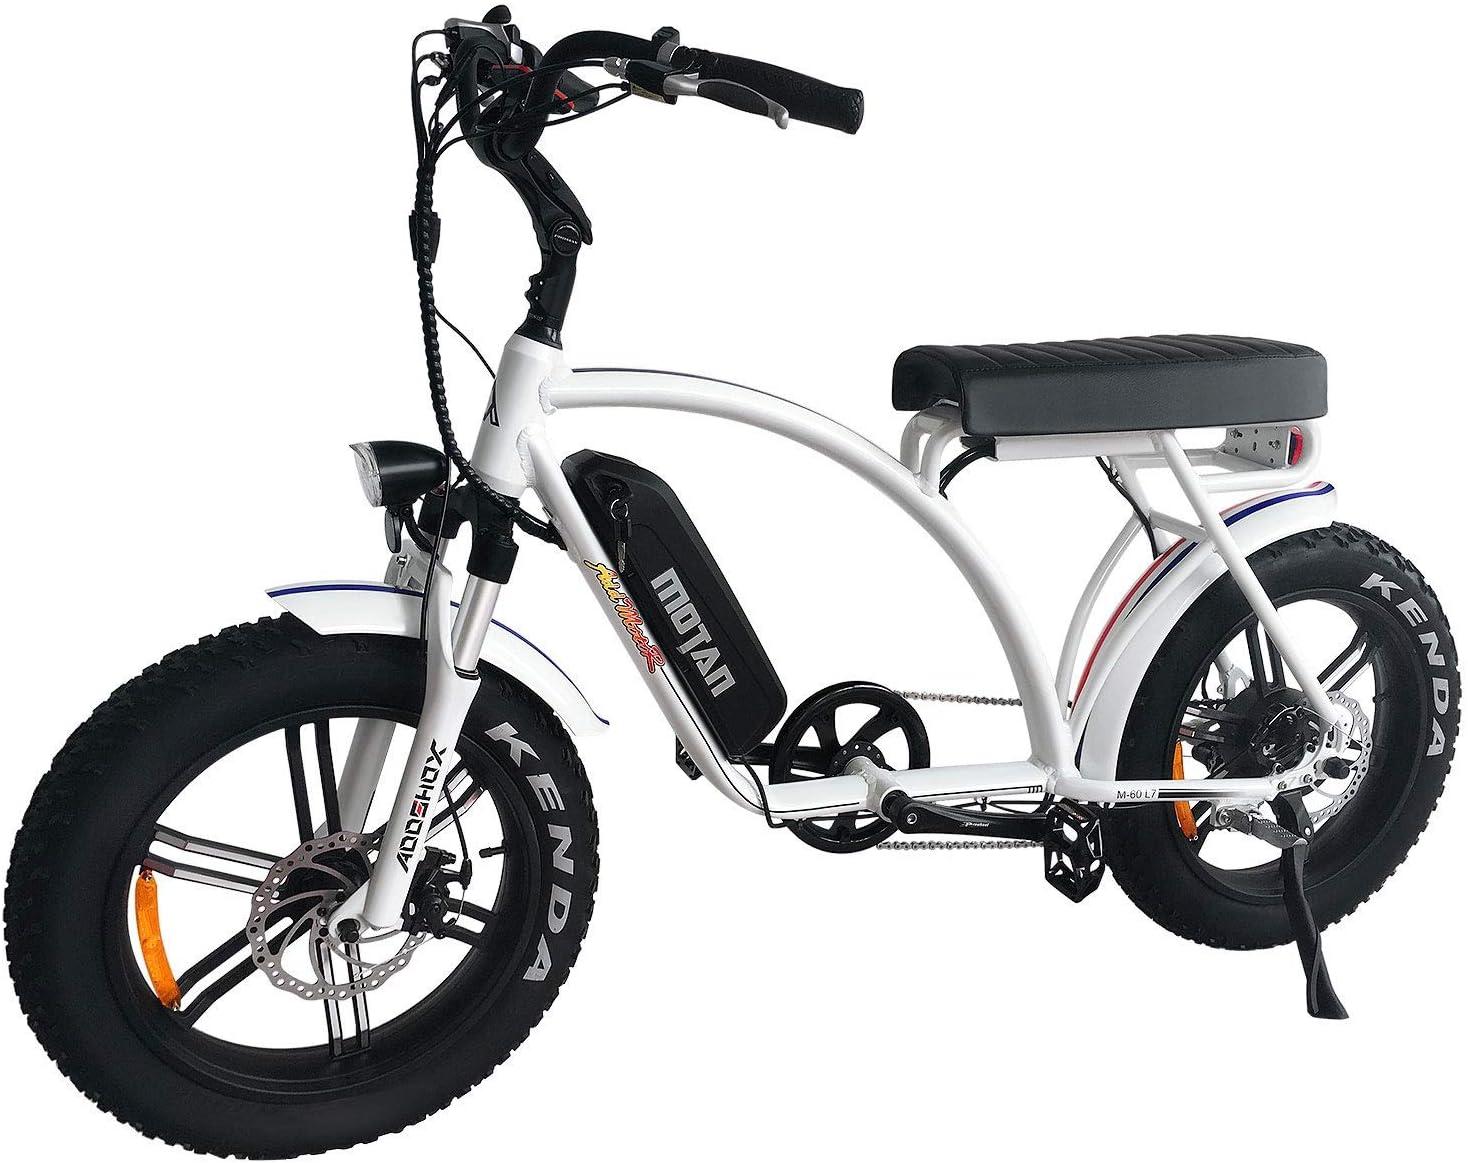 The Best Electric Mini Dirt Bike